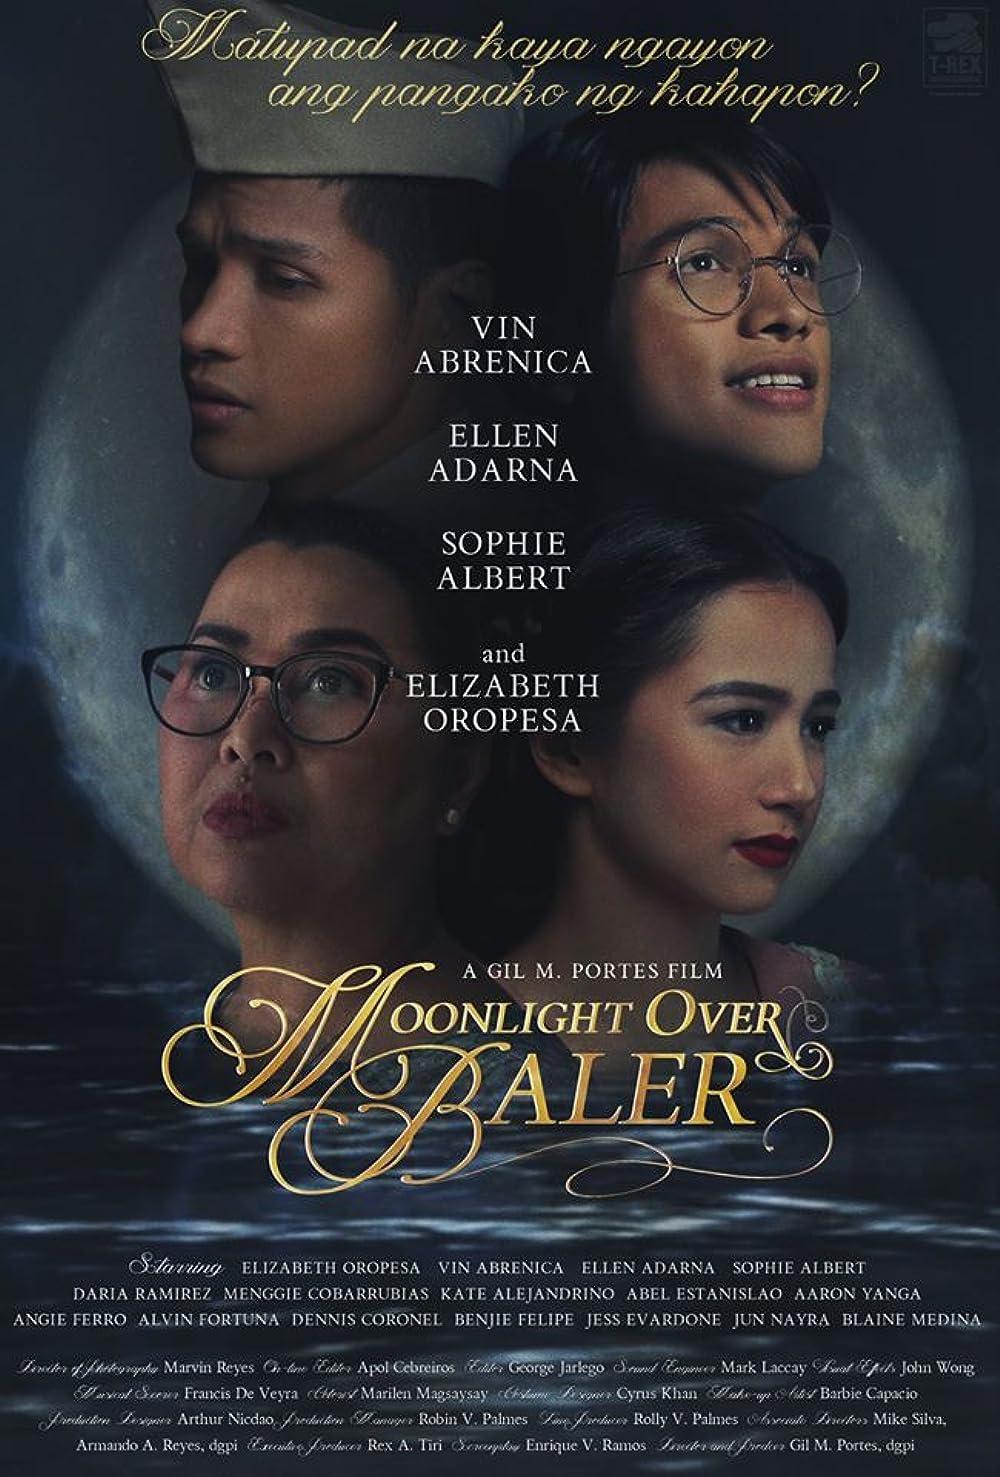 Watch Moonlight Over Baler (2017)